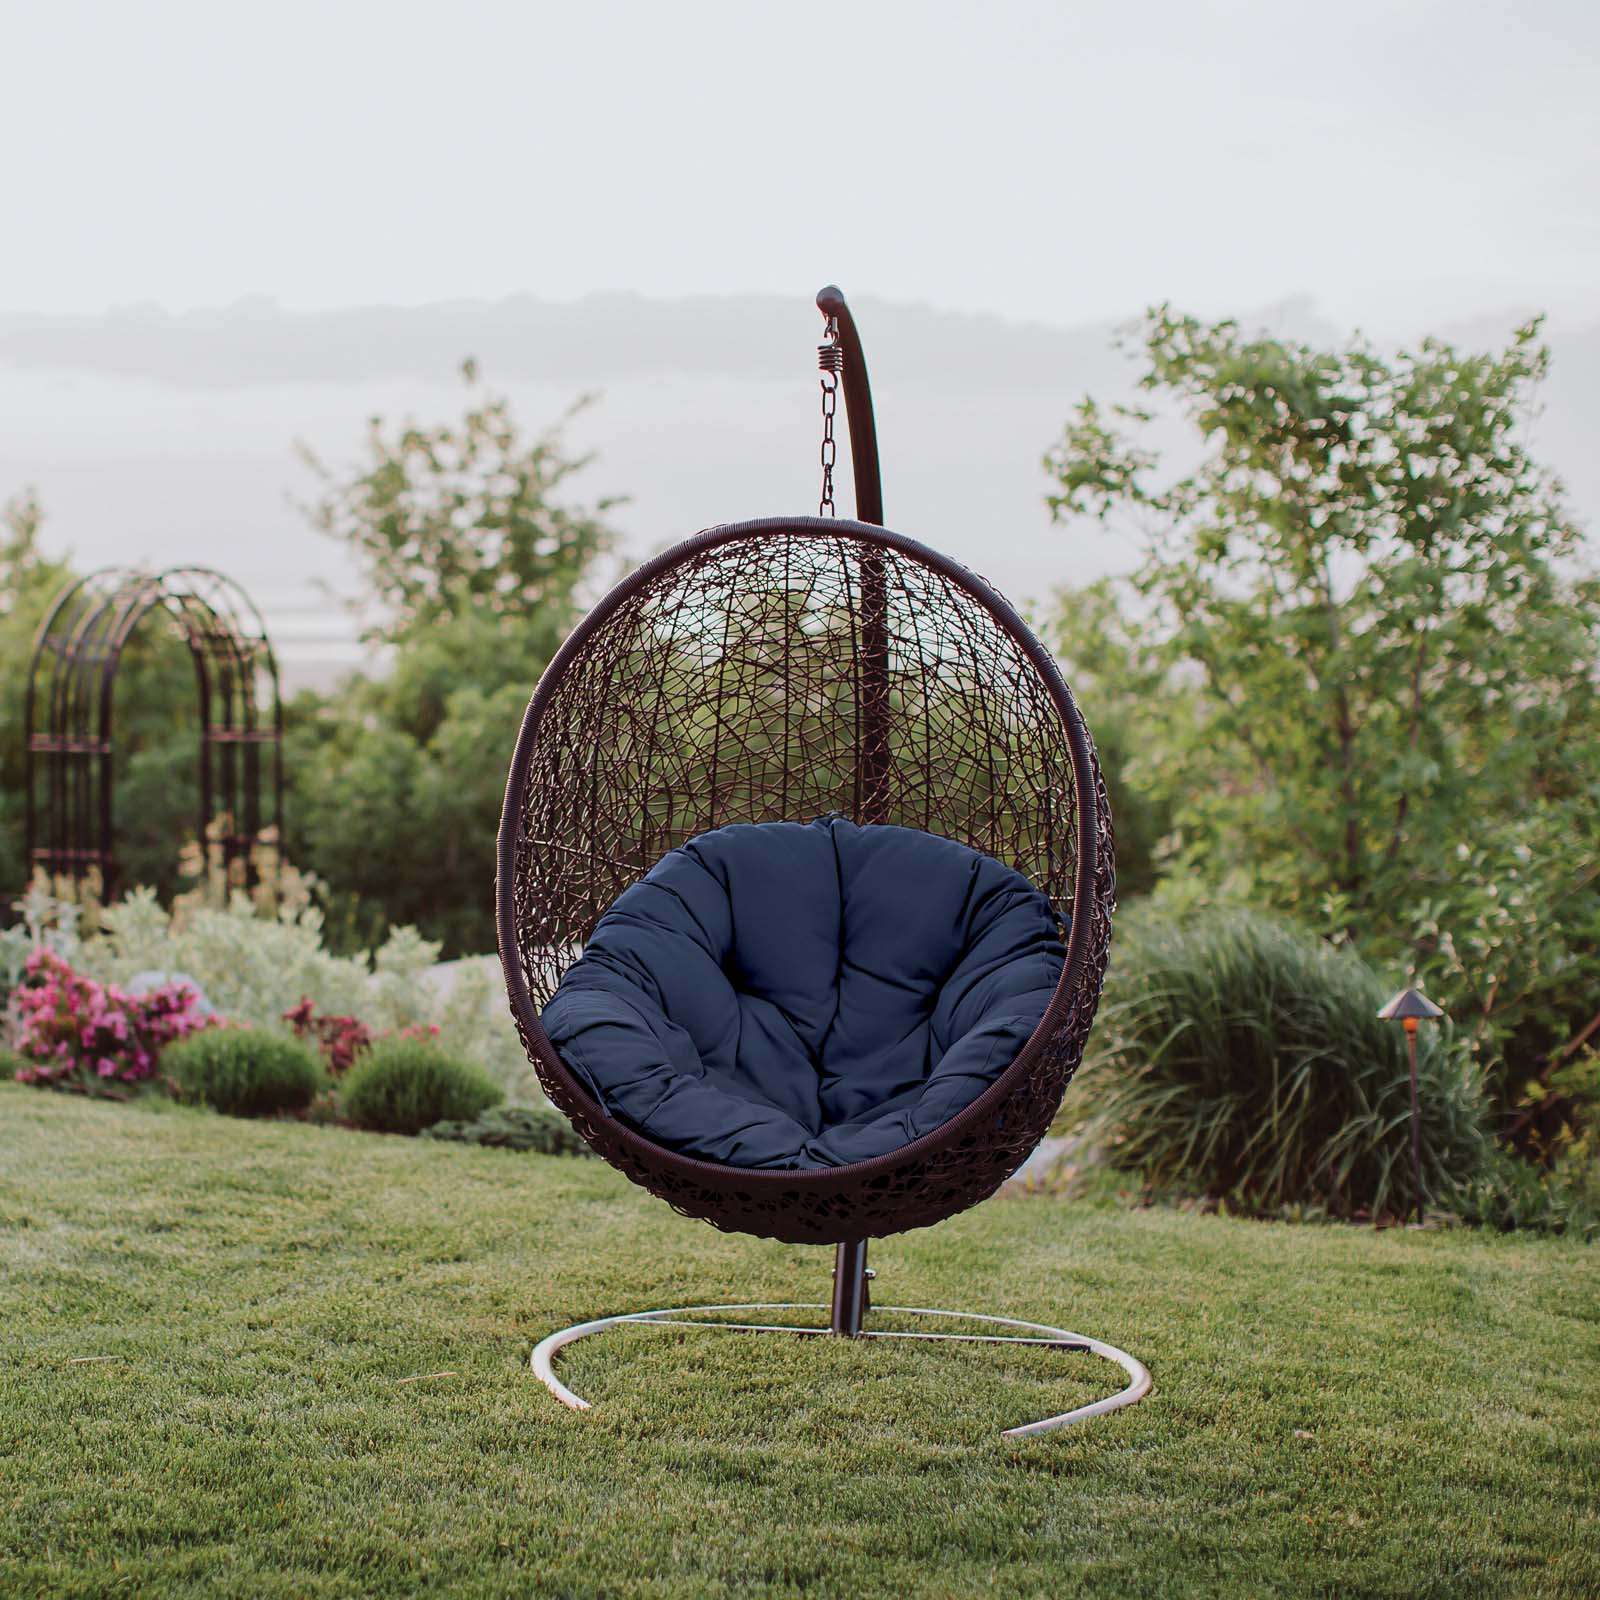 modway encase outdoor patio swing lounge chair multiple colors